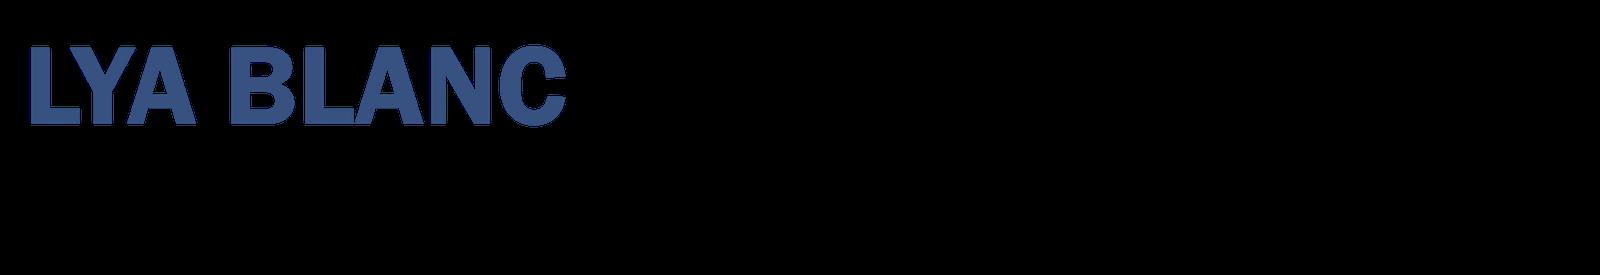 lya blanc  cv